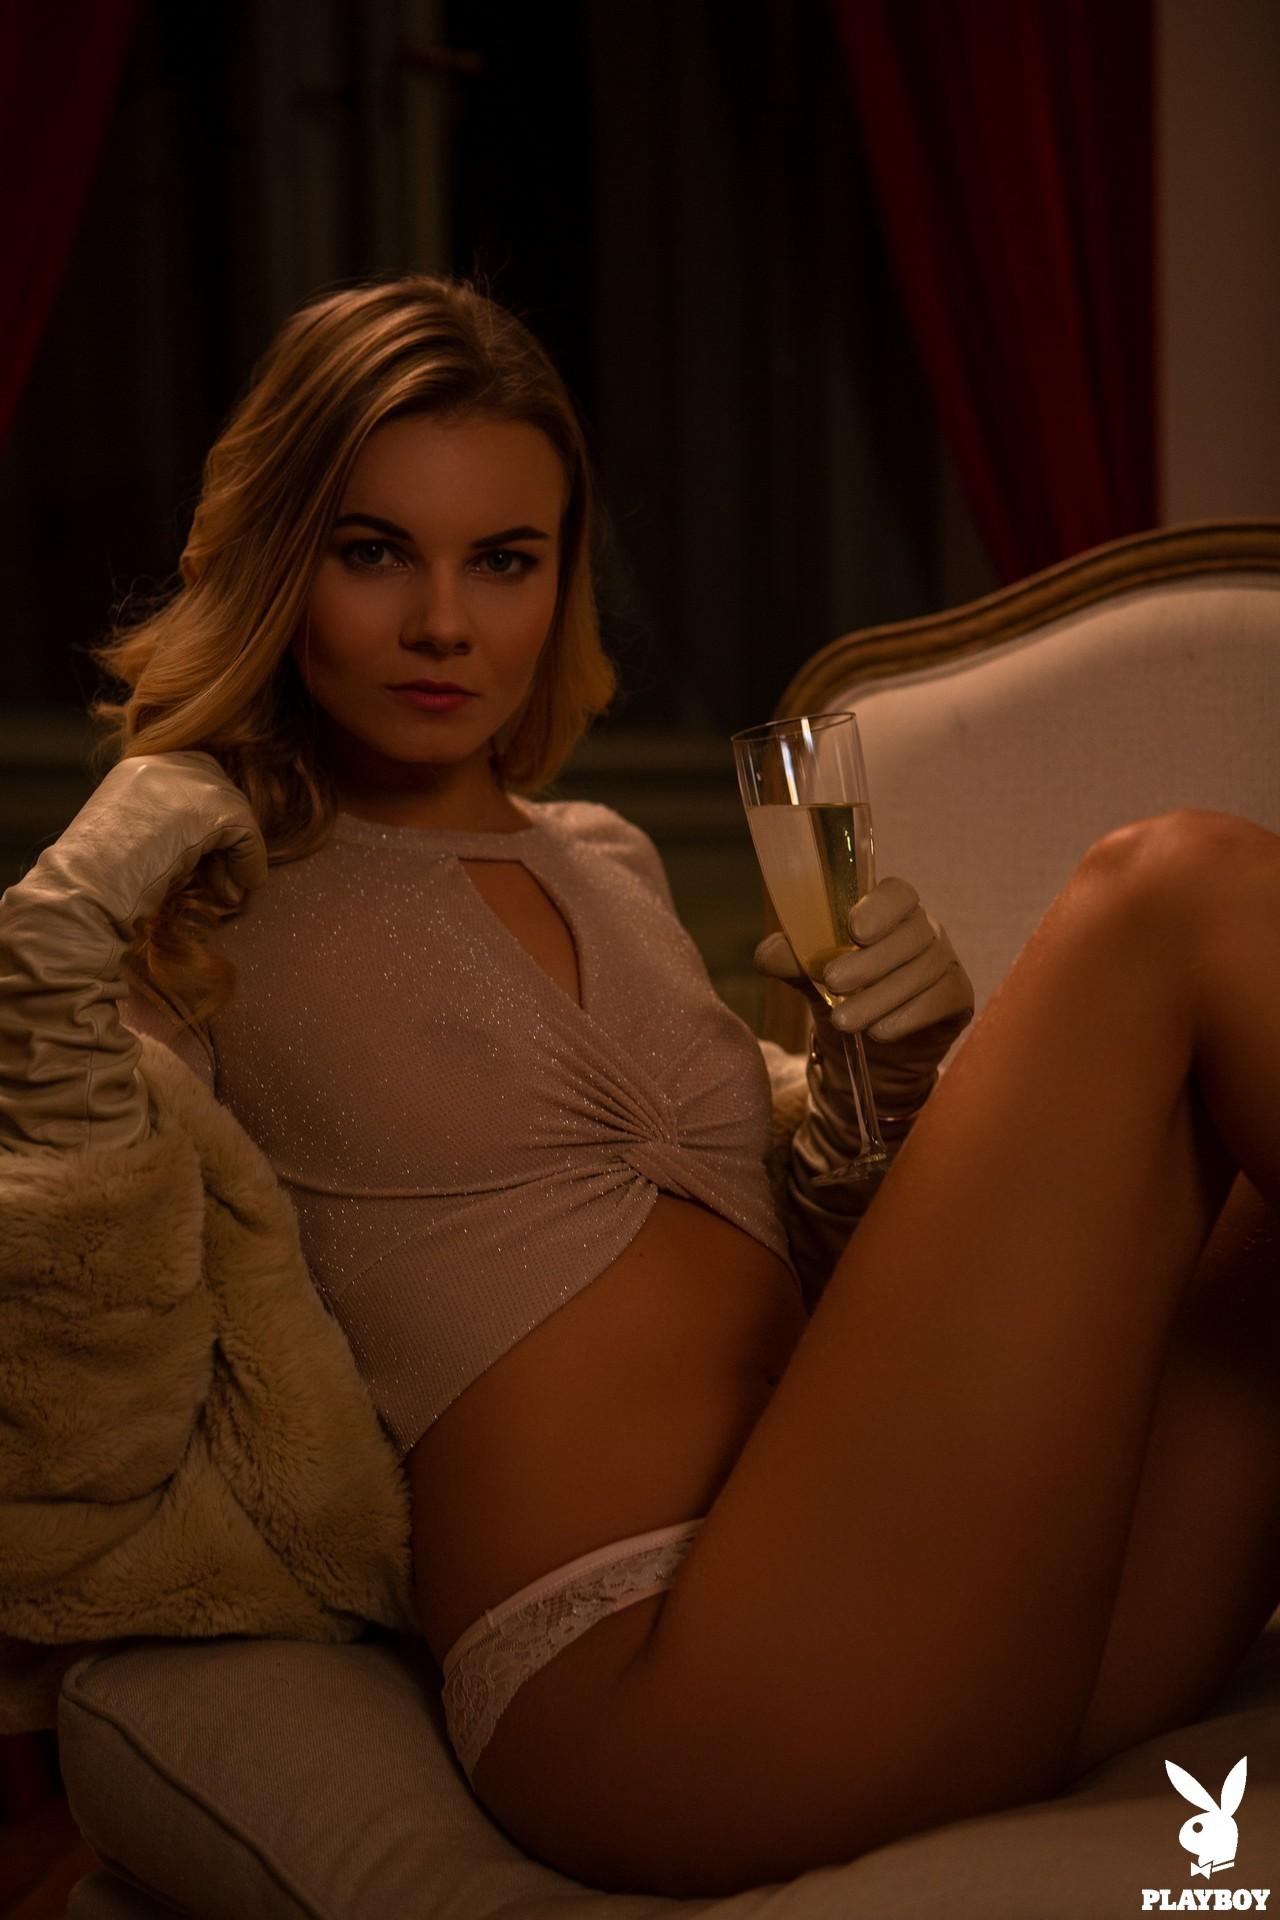 Kate Jones in Exquisite Allure - Playboy Plus 3